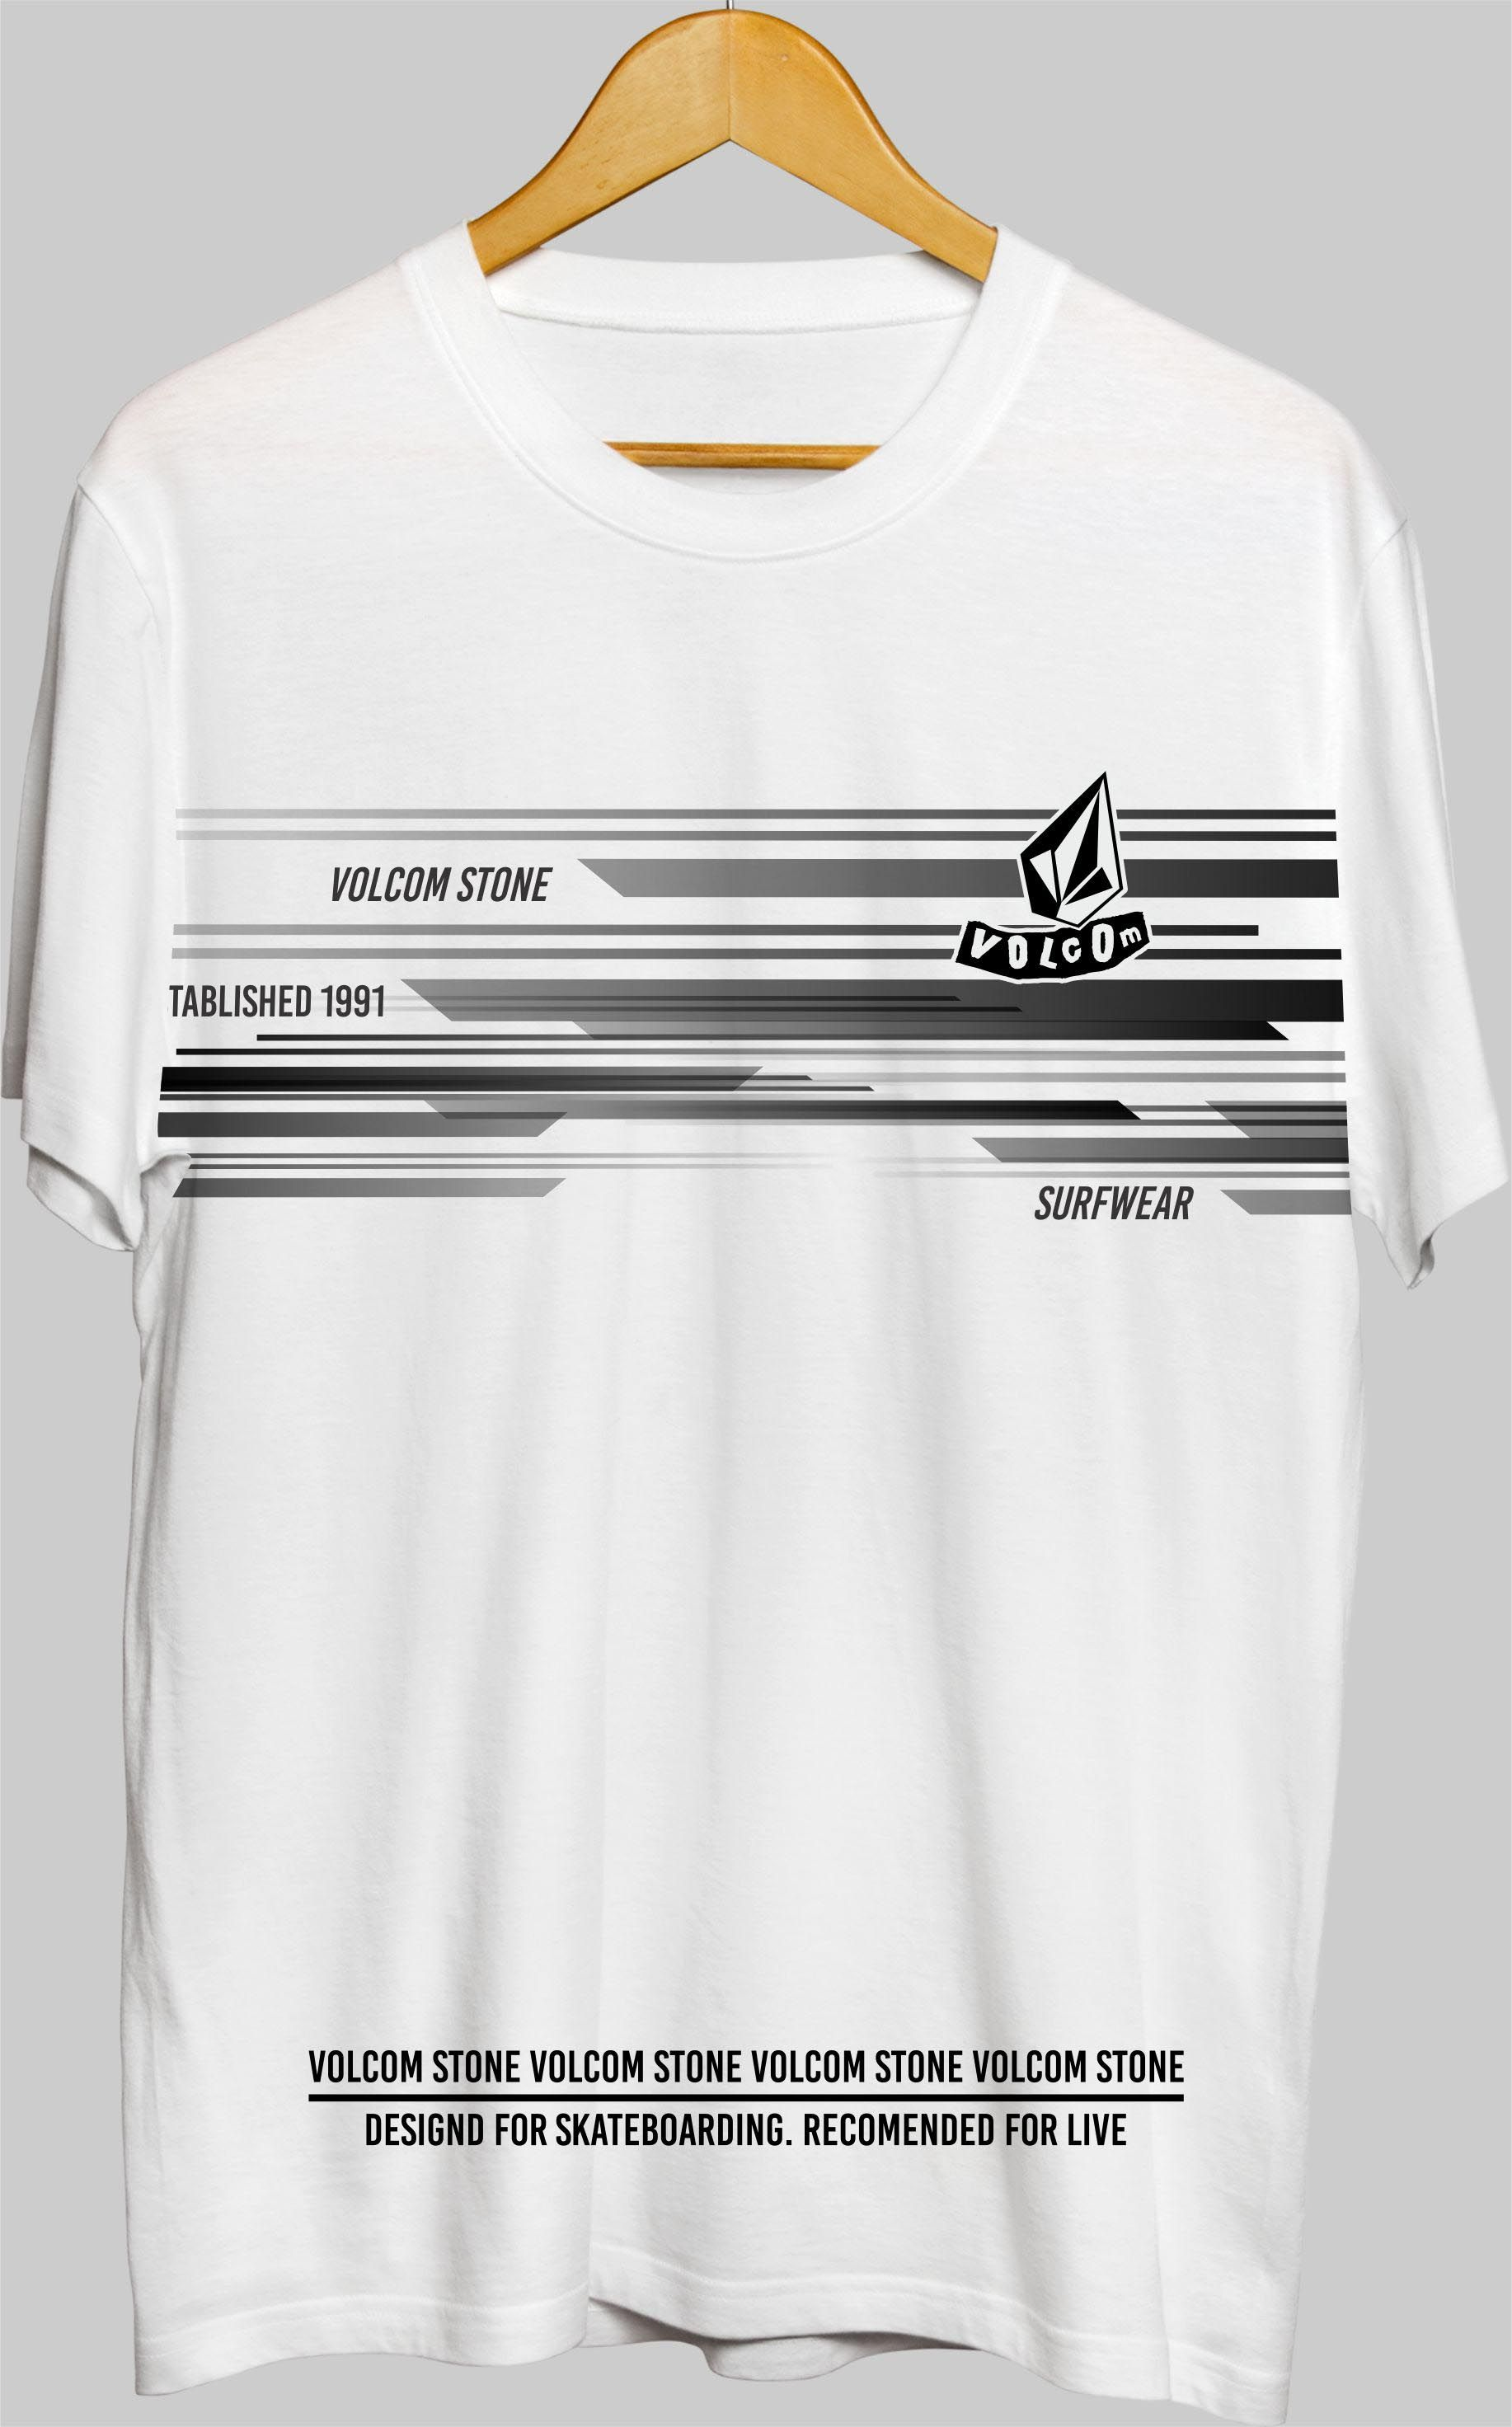 1e35dd3fd Tees #surf #tees #dc #tshirtdesign #dcshoecousa #tshirtdc #billabong #vans  #volcom #quiksilver #ripcurl #teesorogonalsurf #hurley #insight #spyderbilt  ...